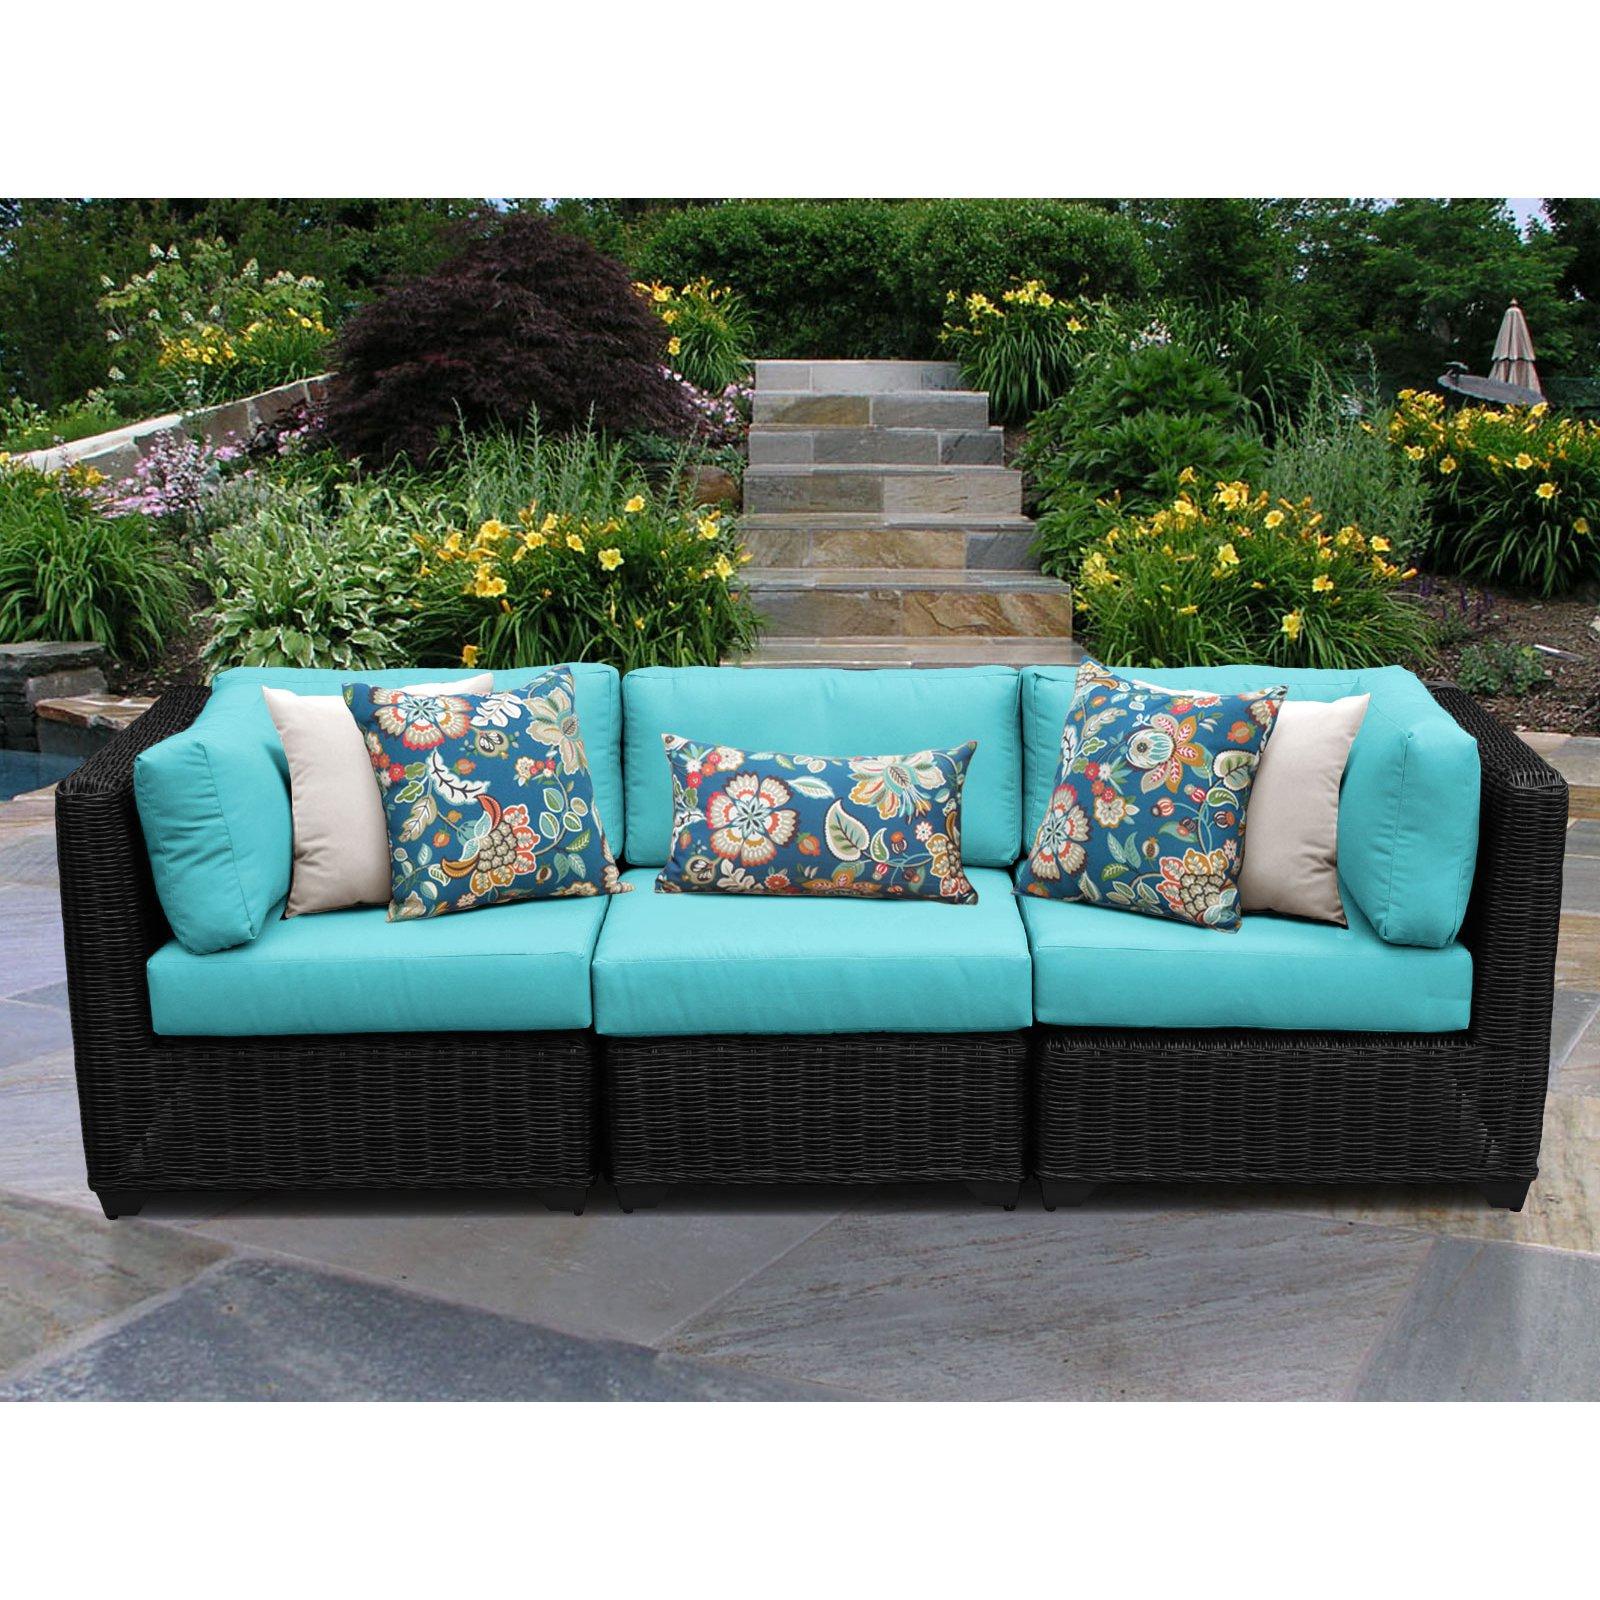 Mcmanis Patio Sofas With Cushion Regarding Famous Tk Classics Venice 3 Piece Outdoor Wicker Patio Conversation (View 13 of 20)